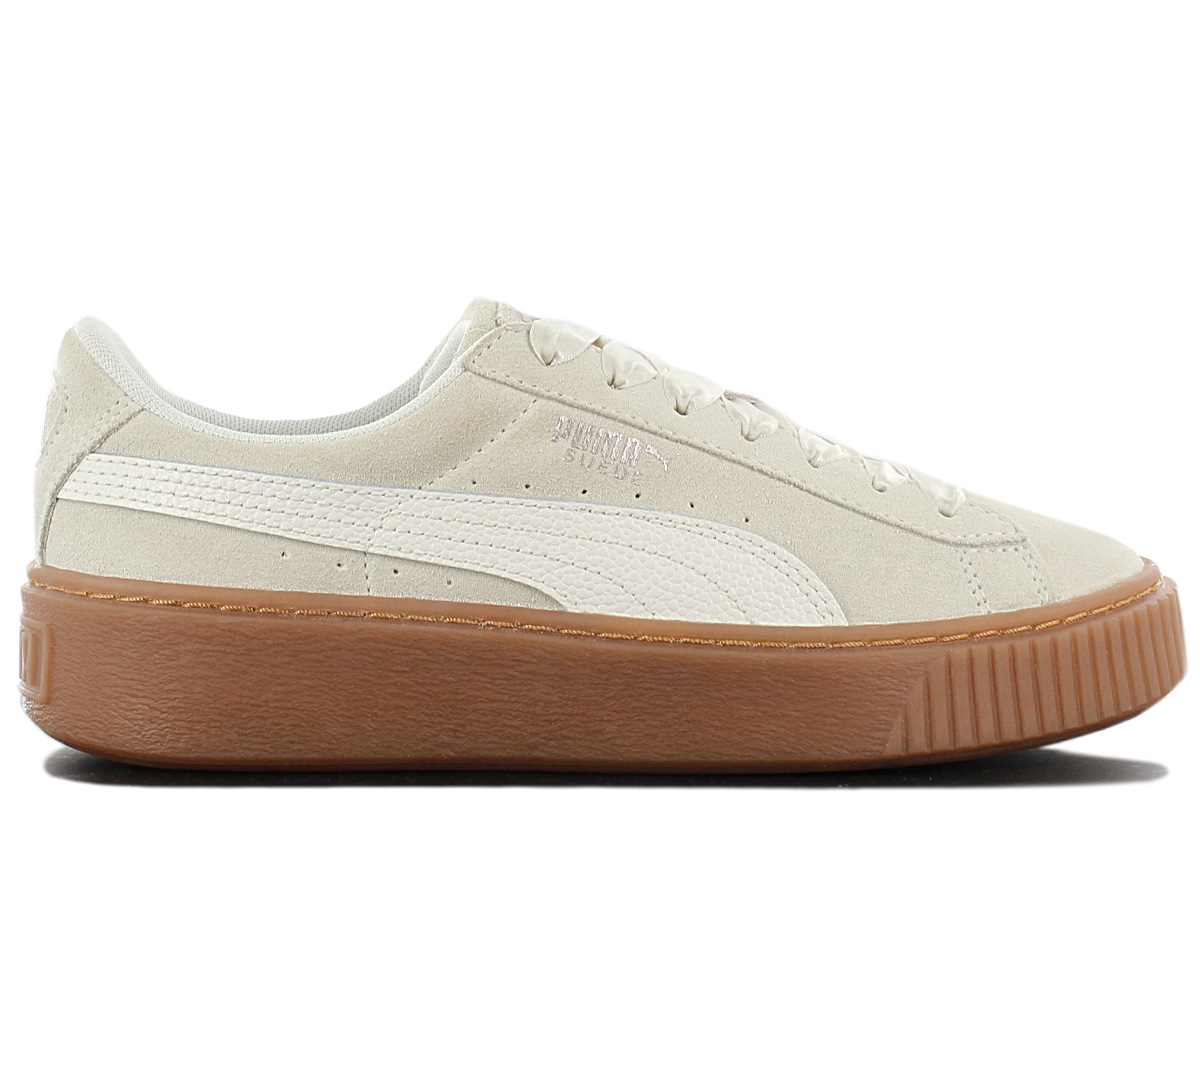 low priced 3323c 3cad5 Details about Puma Suede Platform Bubble Women's Sneaker Shoes 366439-02  Beige Trainers New